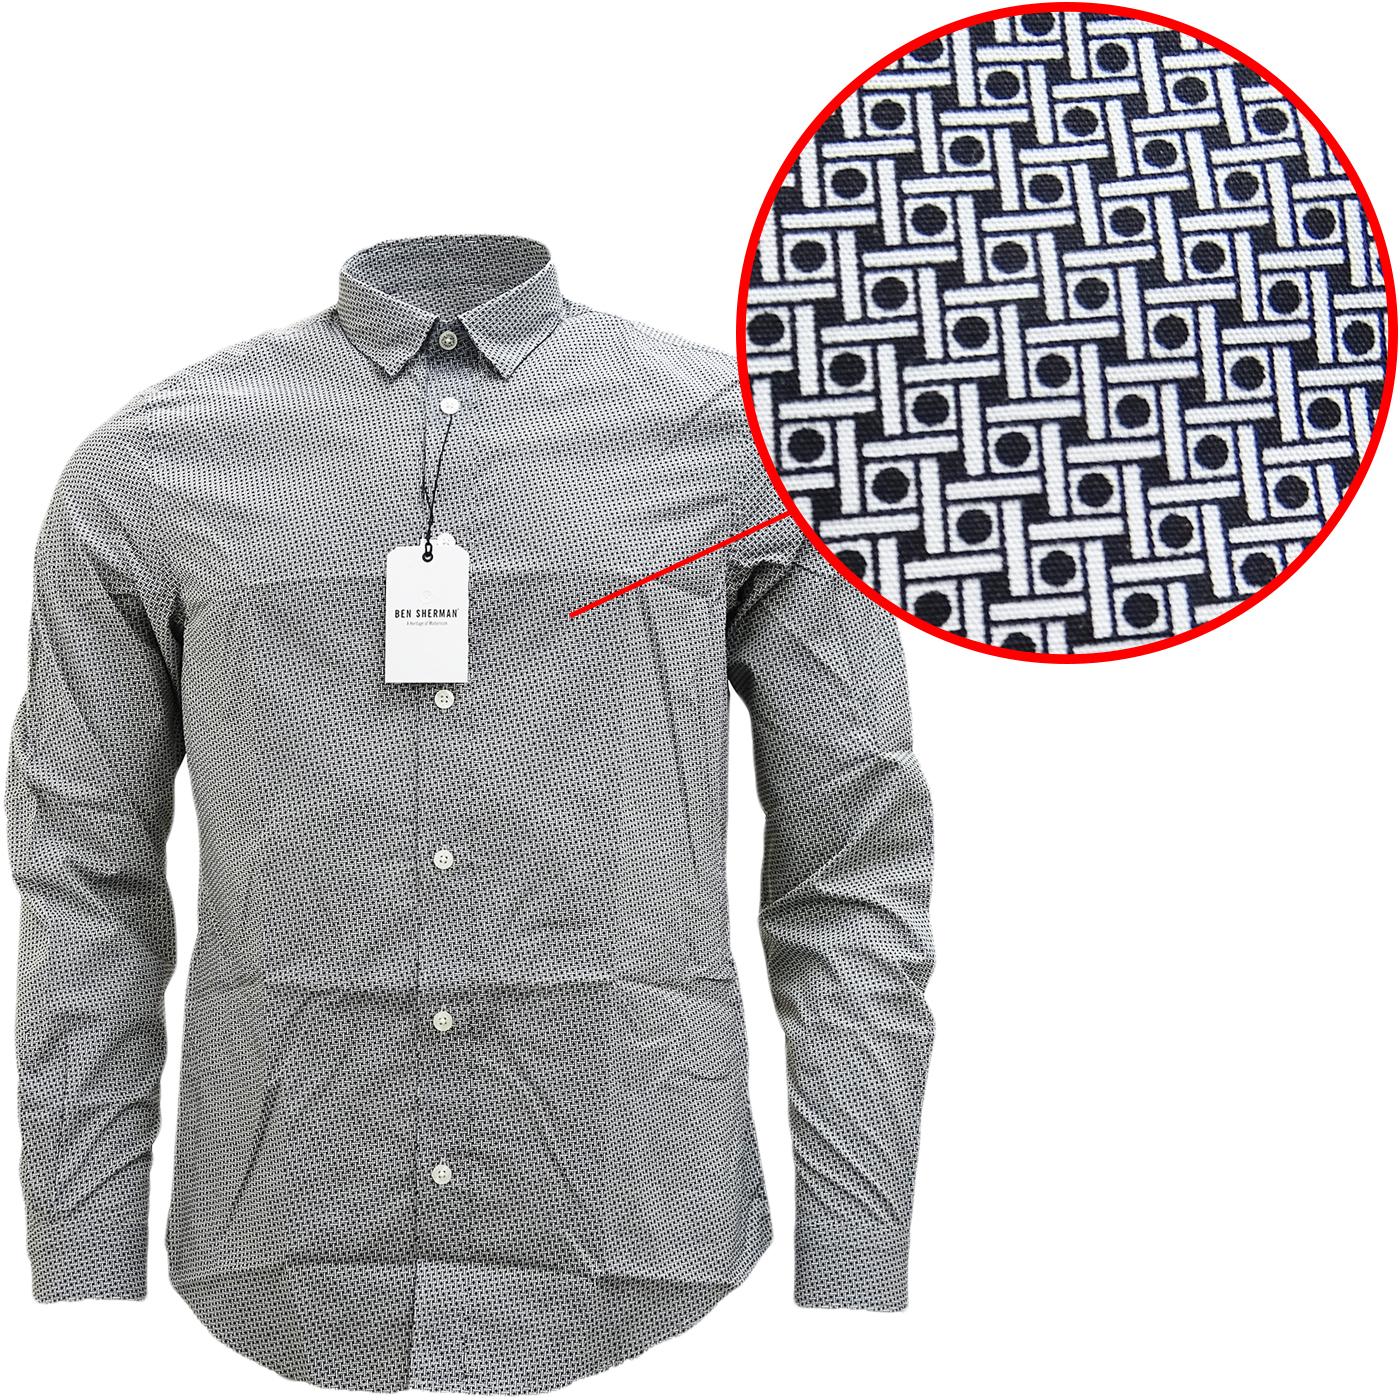 Ben Sherman Square & Spot Black Shirt MA13006